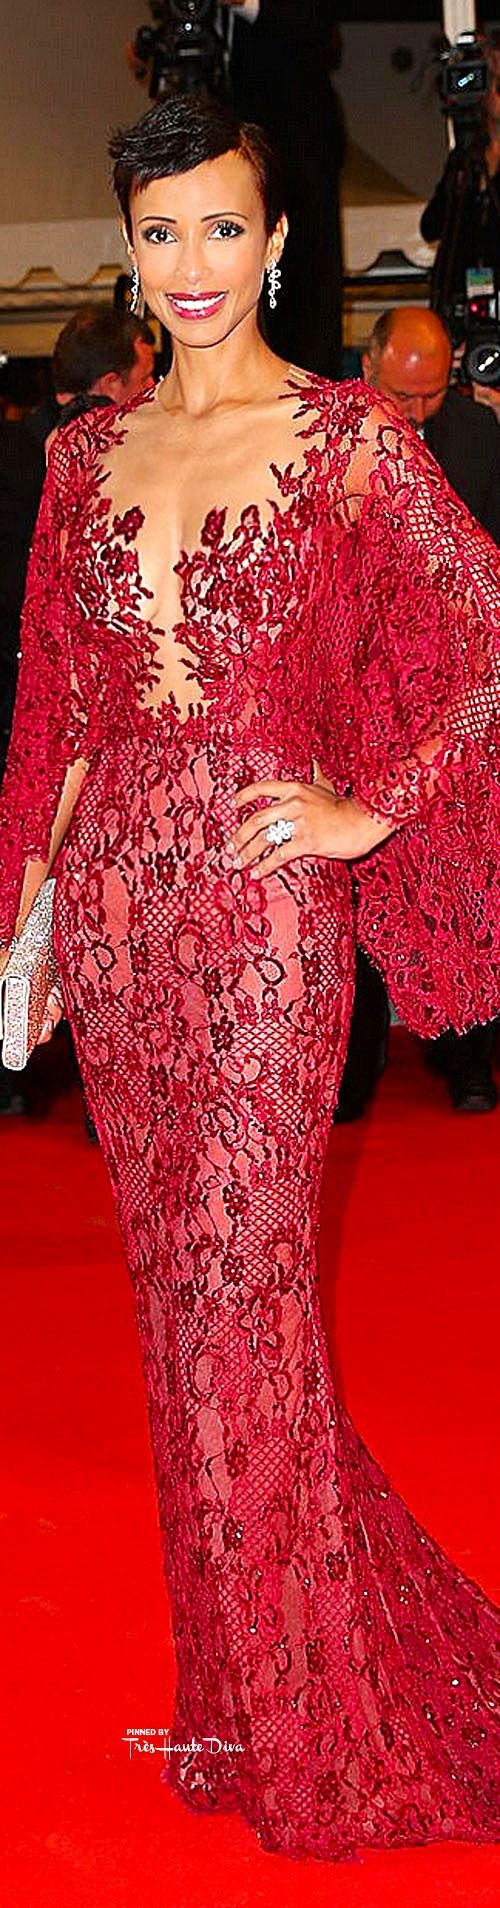 #Sonia #Rolland in Zuhair Murad♔ Cannes Film Festival 2015 Red Carpet ♔ Très Haute Diva ♔